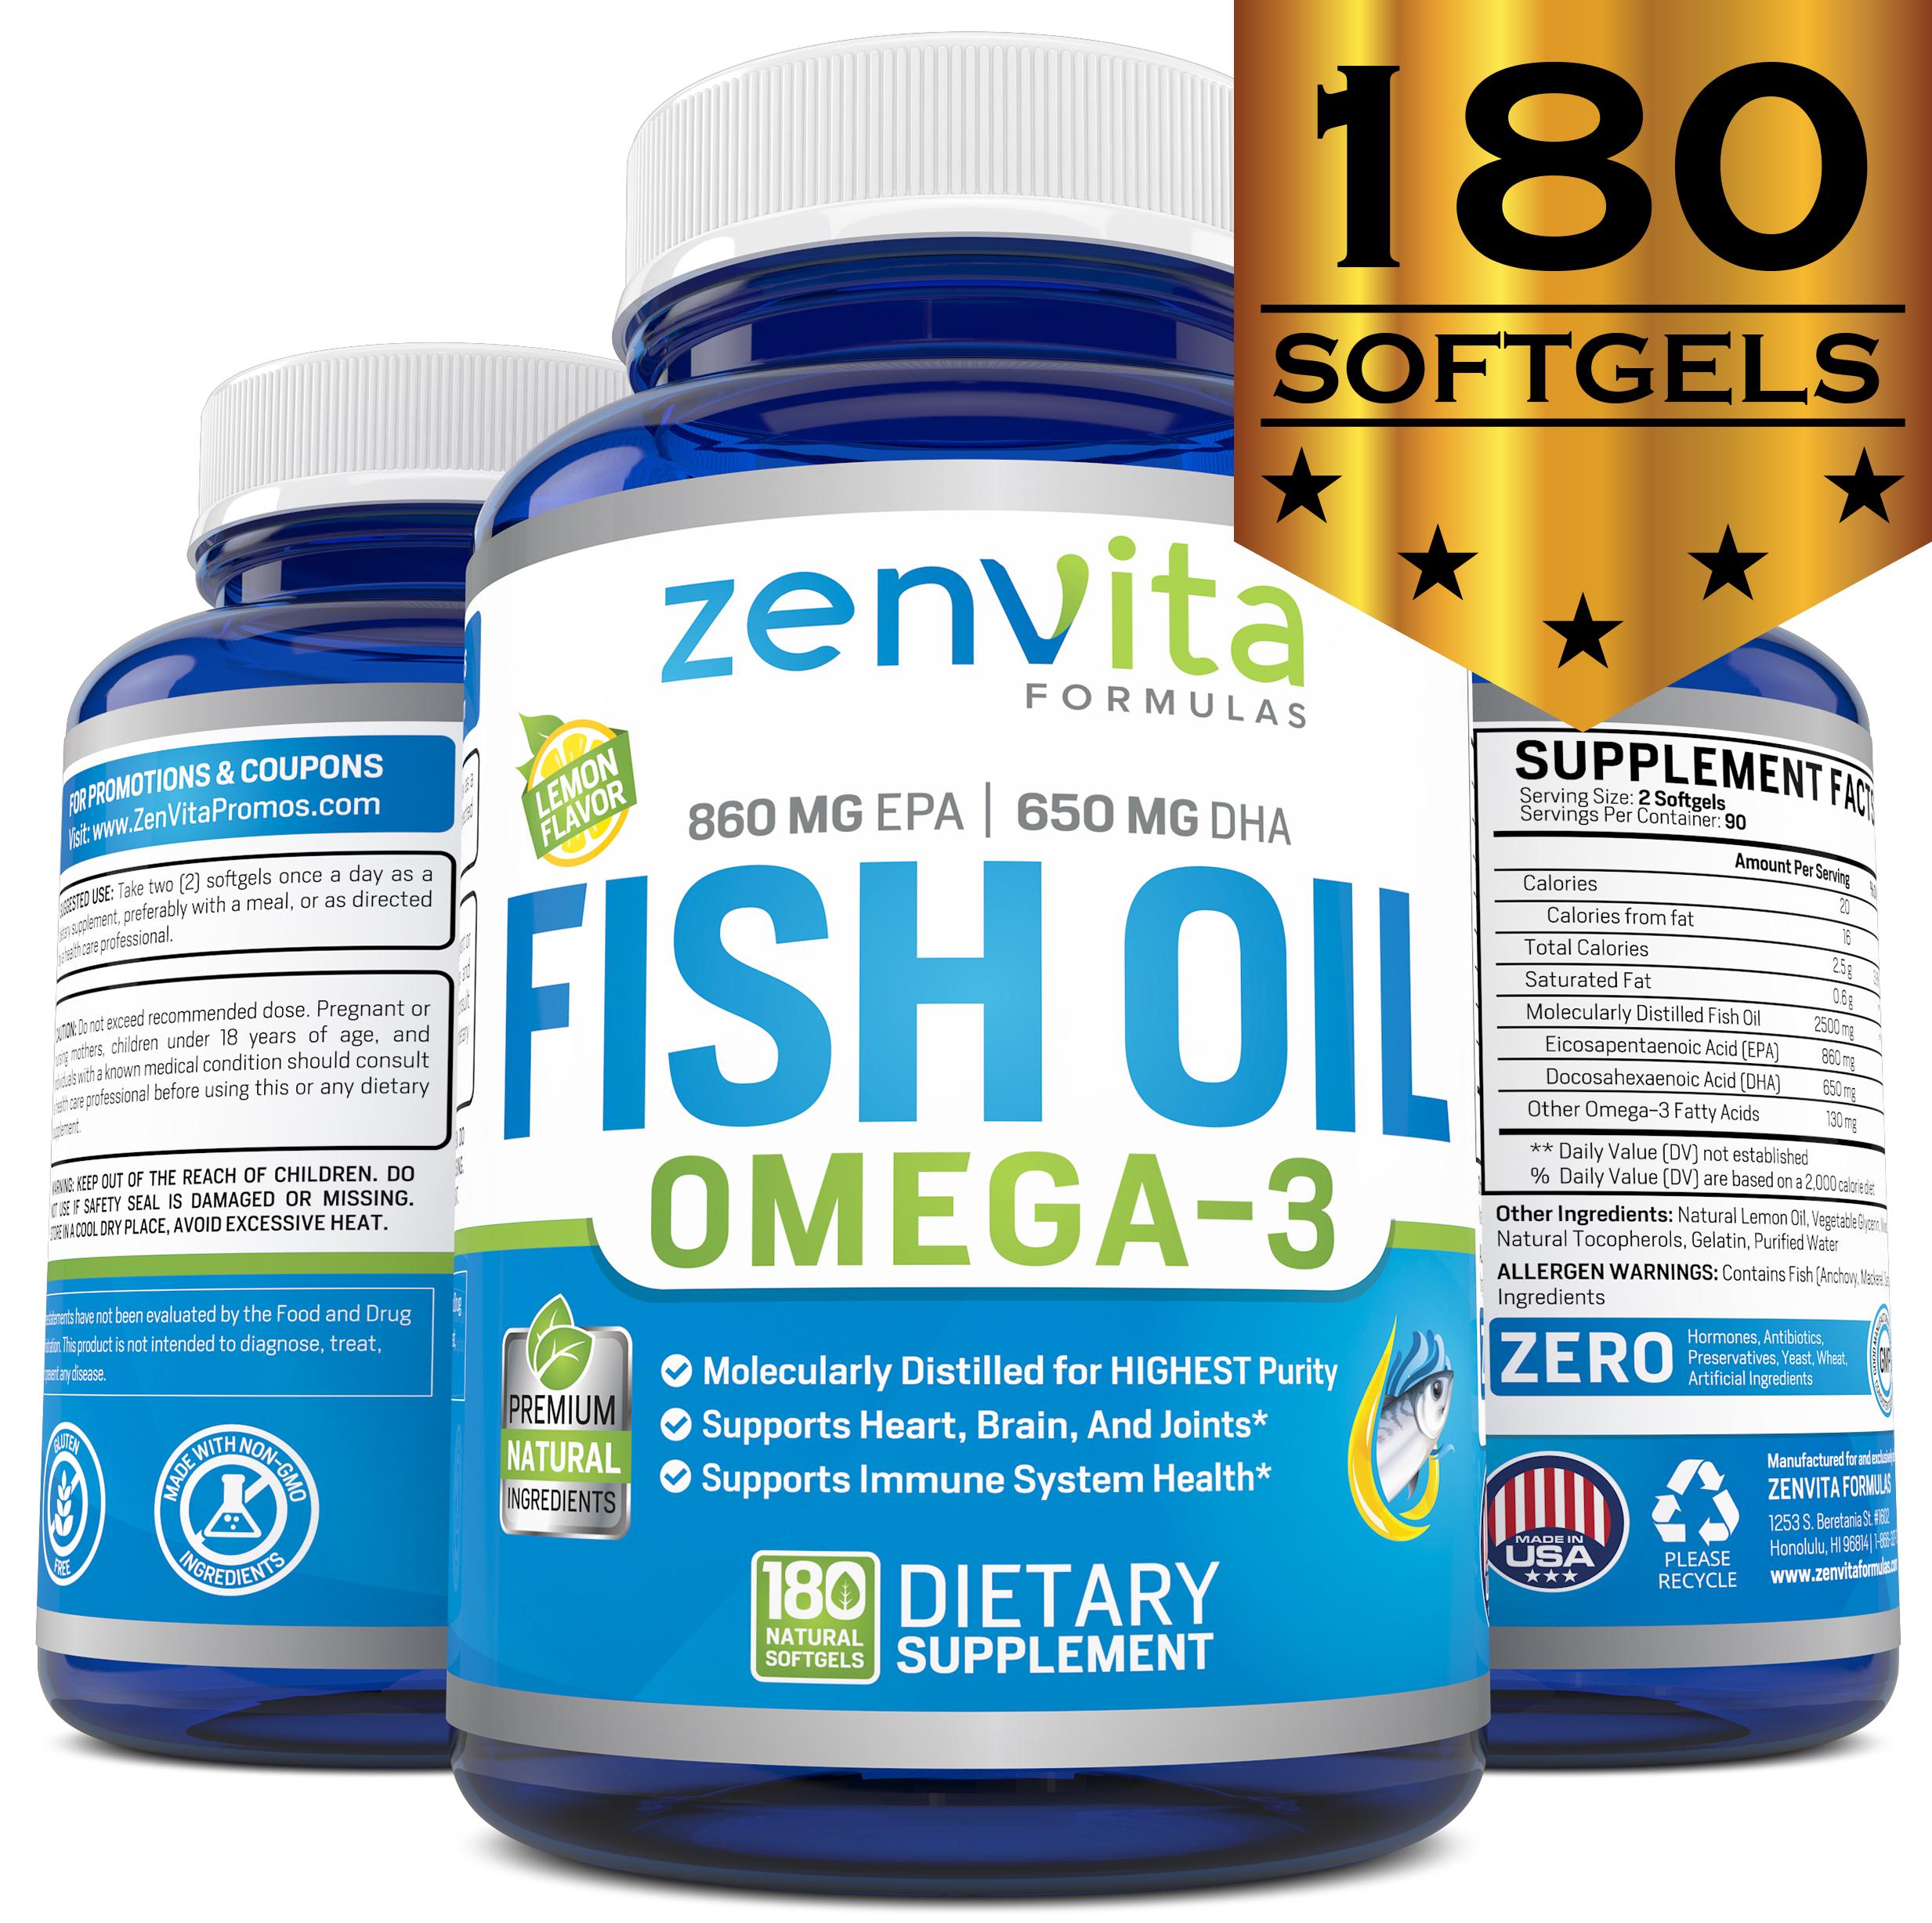 ZenVita Formulas Omega 3 Fish Oil Capsules - 180 Softgels, Lemon Flavored - NO Fishy Aftertaste, Non GMO & Gluten FREE, Pharmaceutical Grade, Molecularly Distilled & Mercury Free